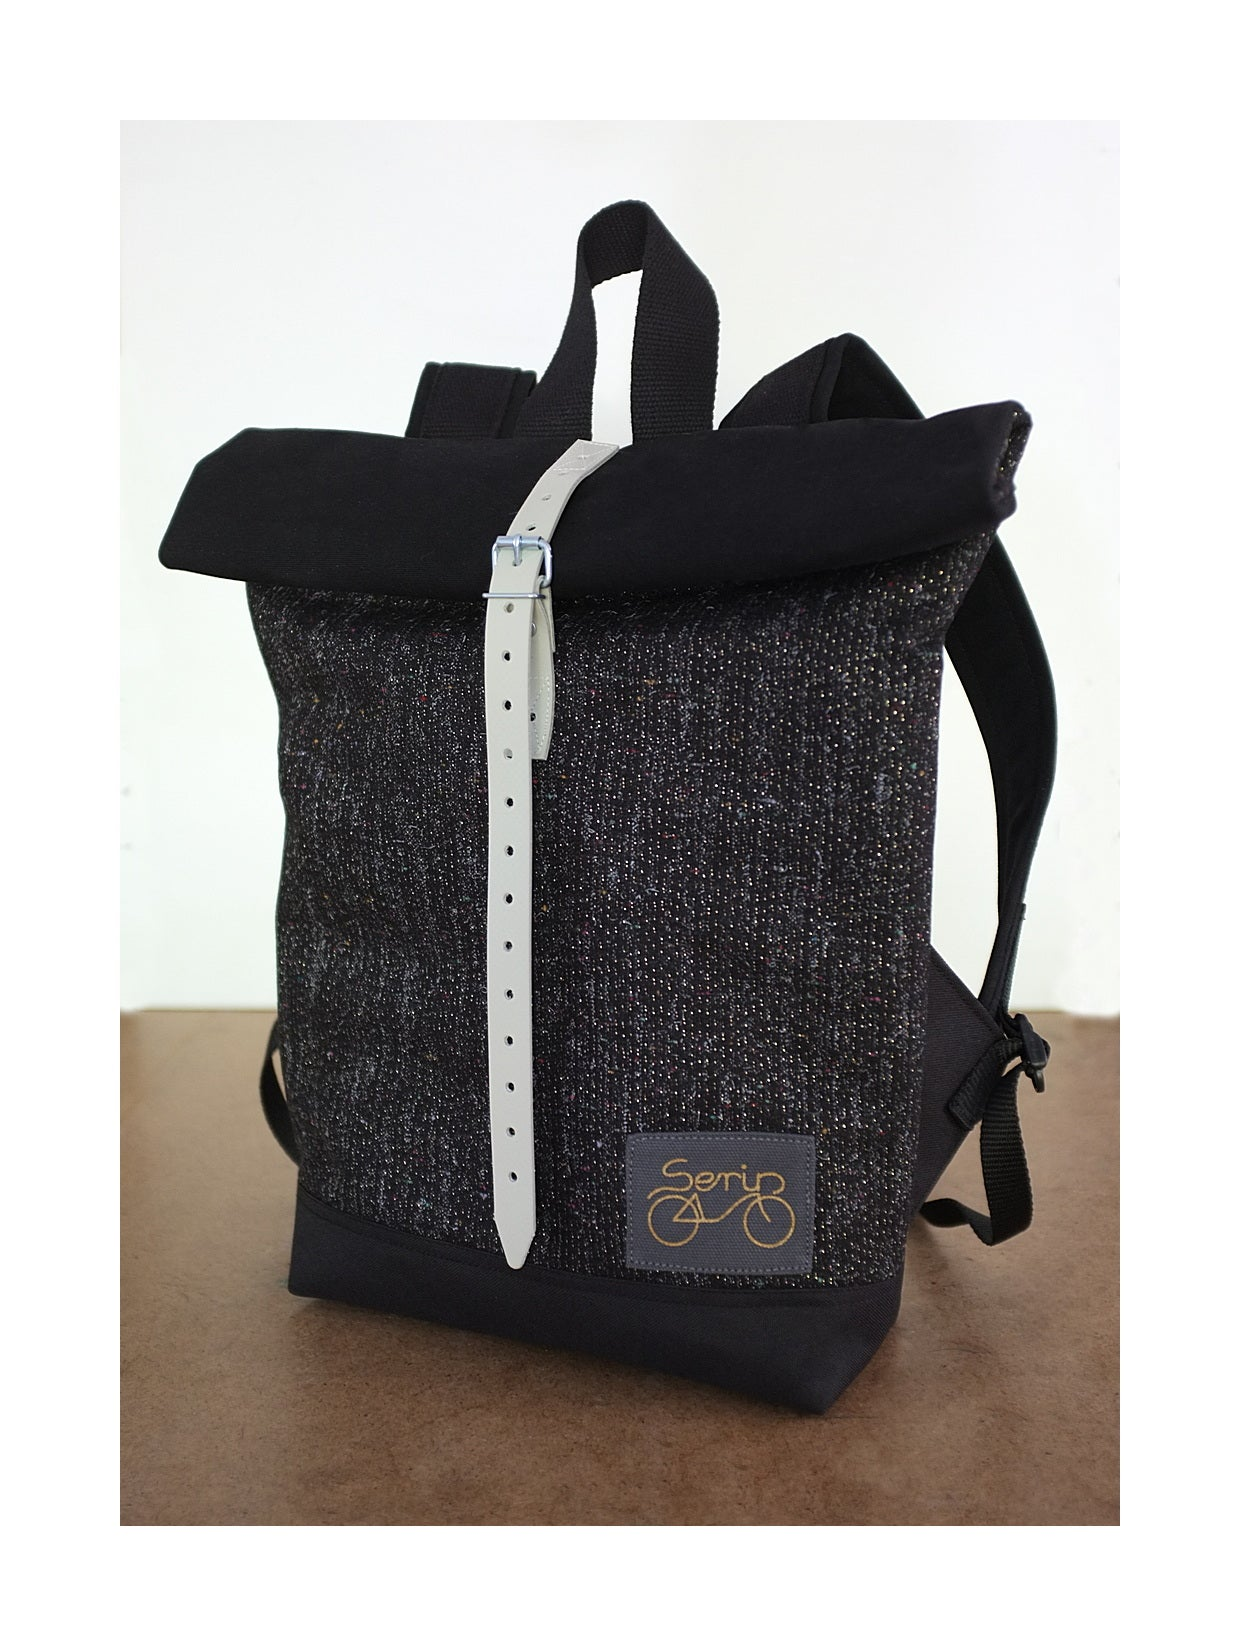 Image of Serin dark backpack